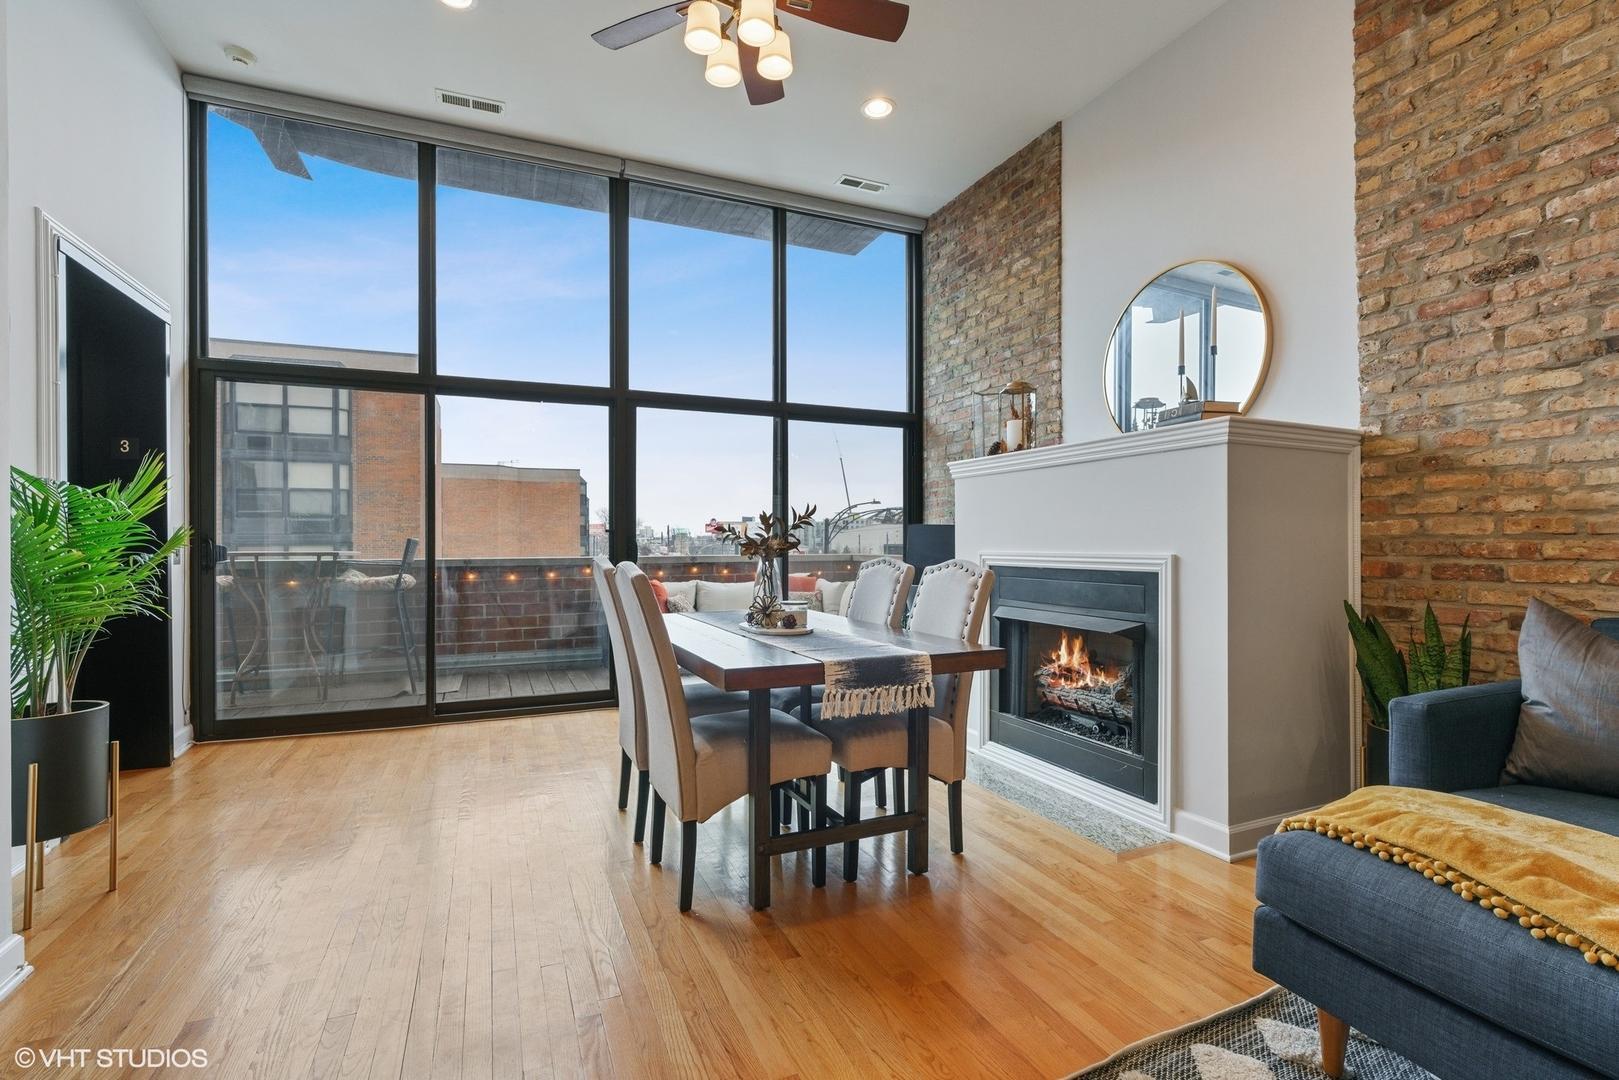 1552 W FULLERTON  Avenue, Unit 3 photo